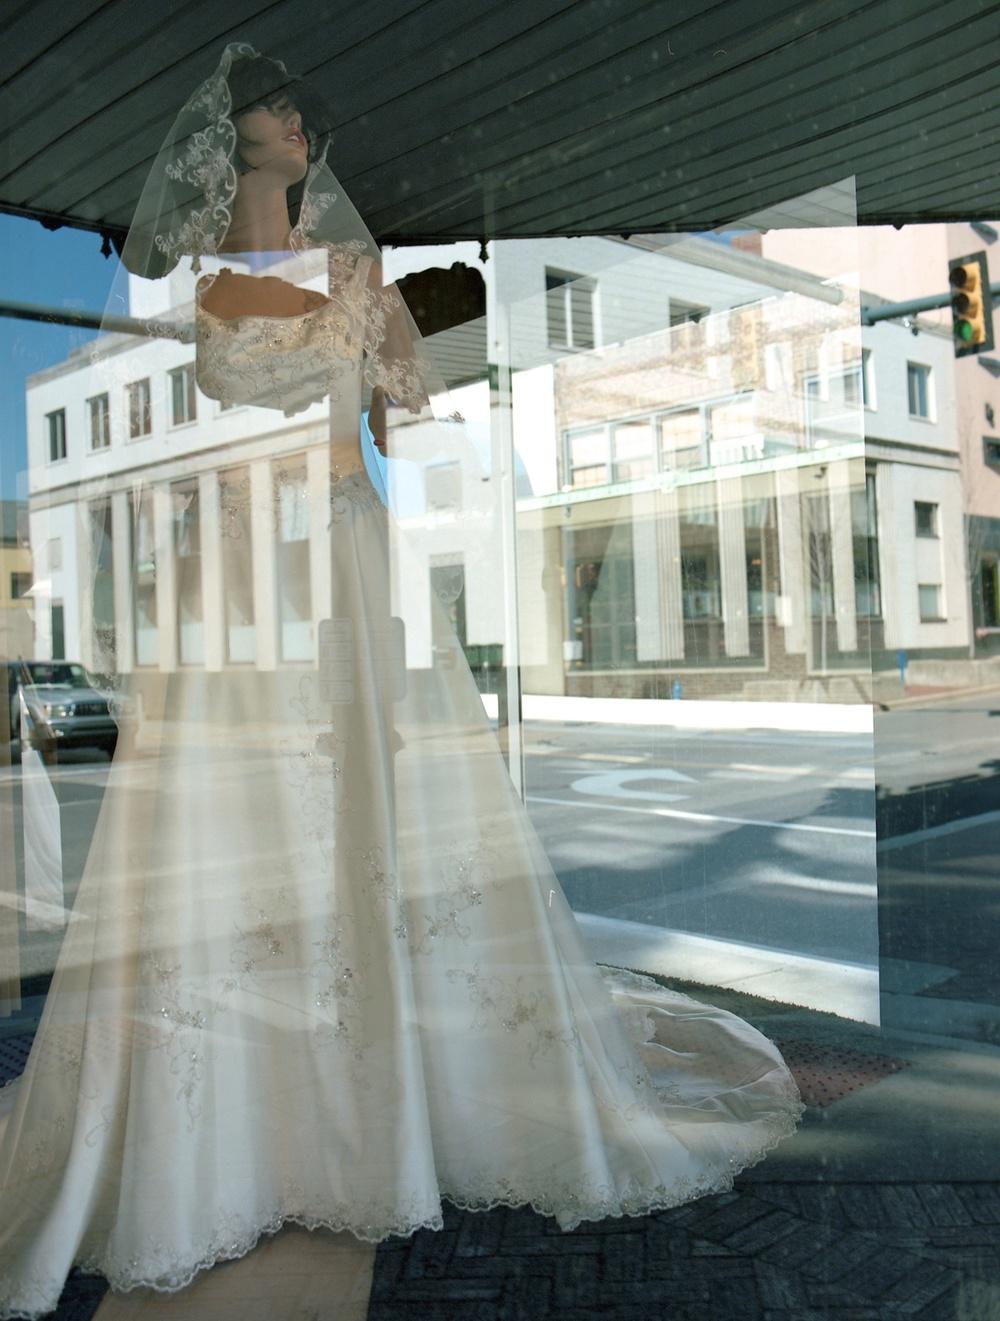 Massengill's Mannequin, Johnson City, TN. 2014. C-Print.